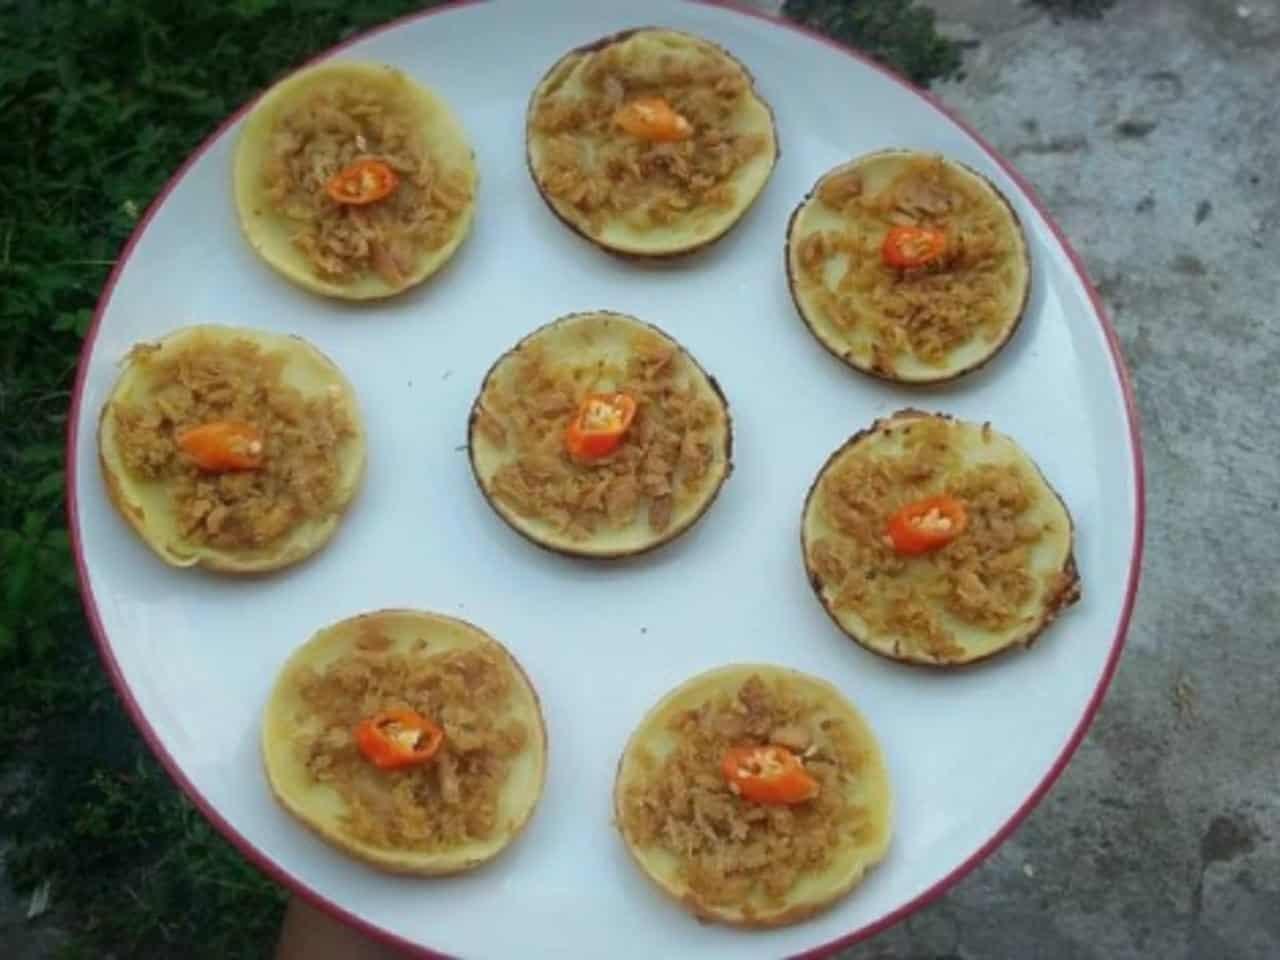 gambar makanan khas gorontalo Kue Cara Isi